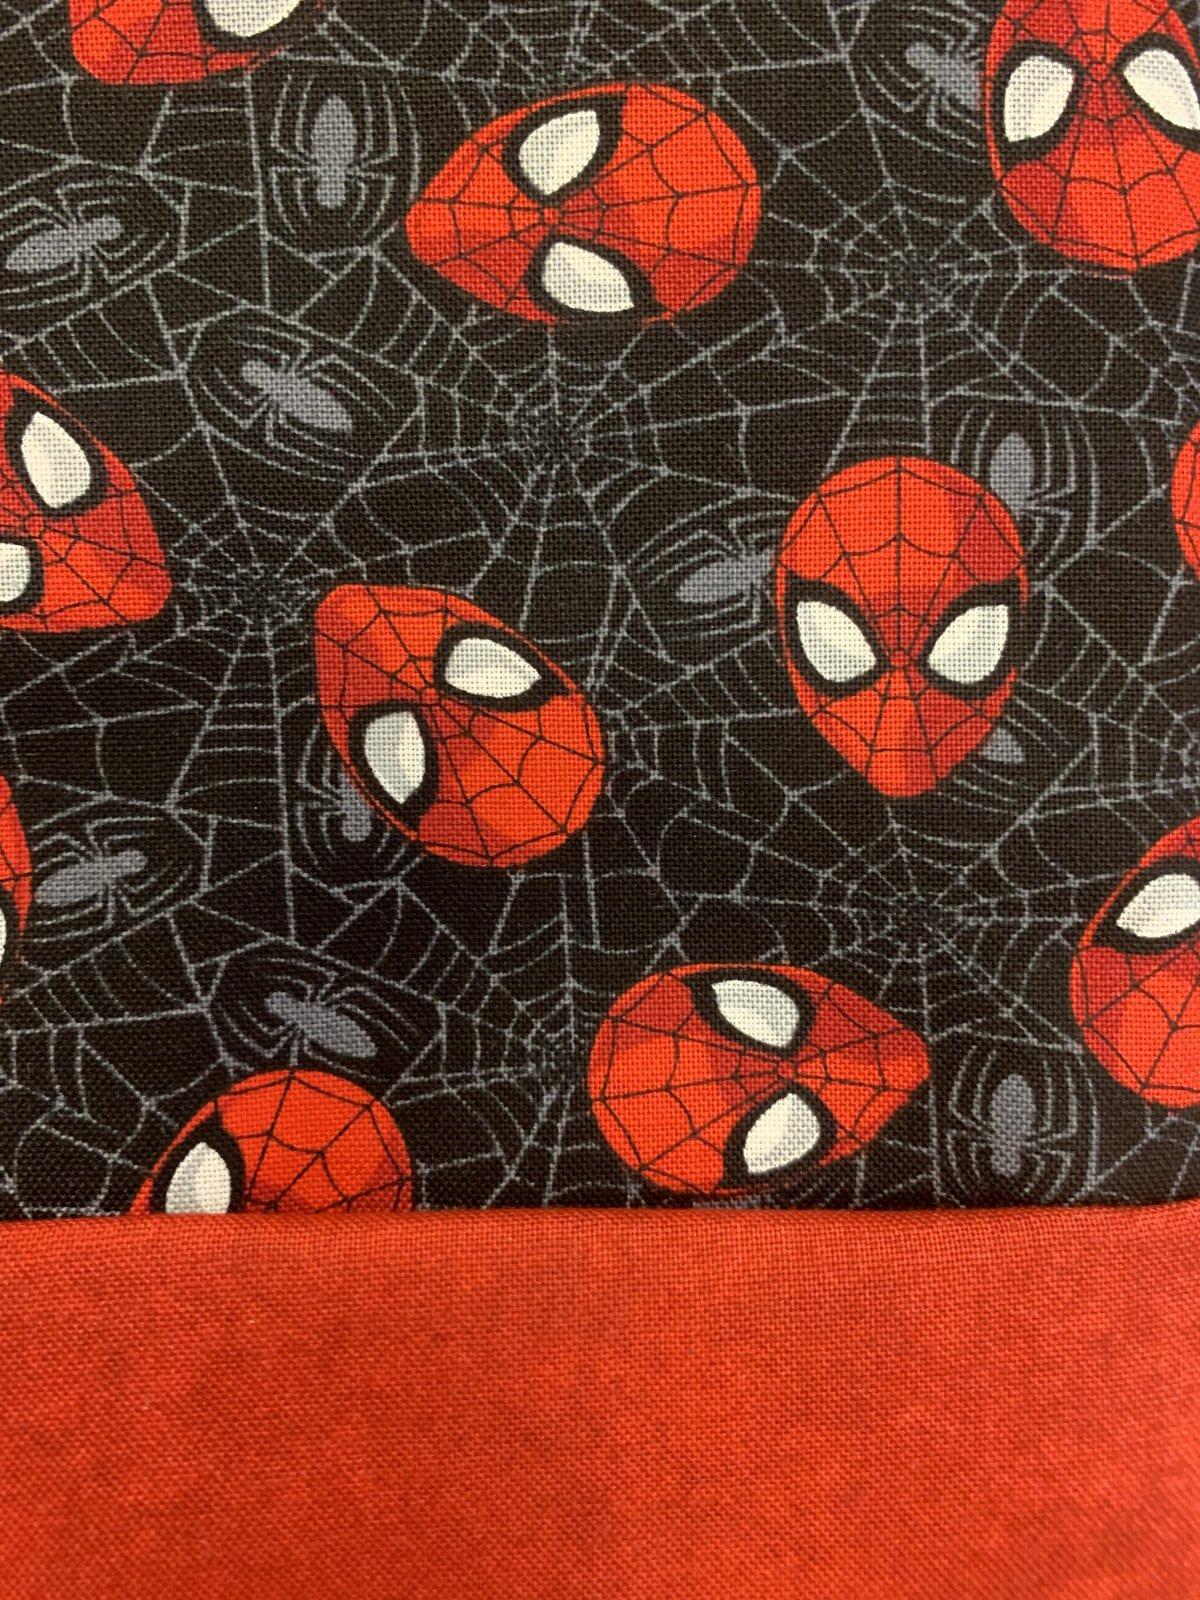 Spider-Man Pillowcase Kit